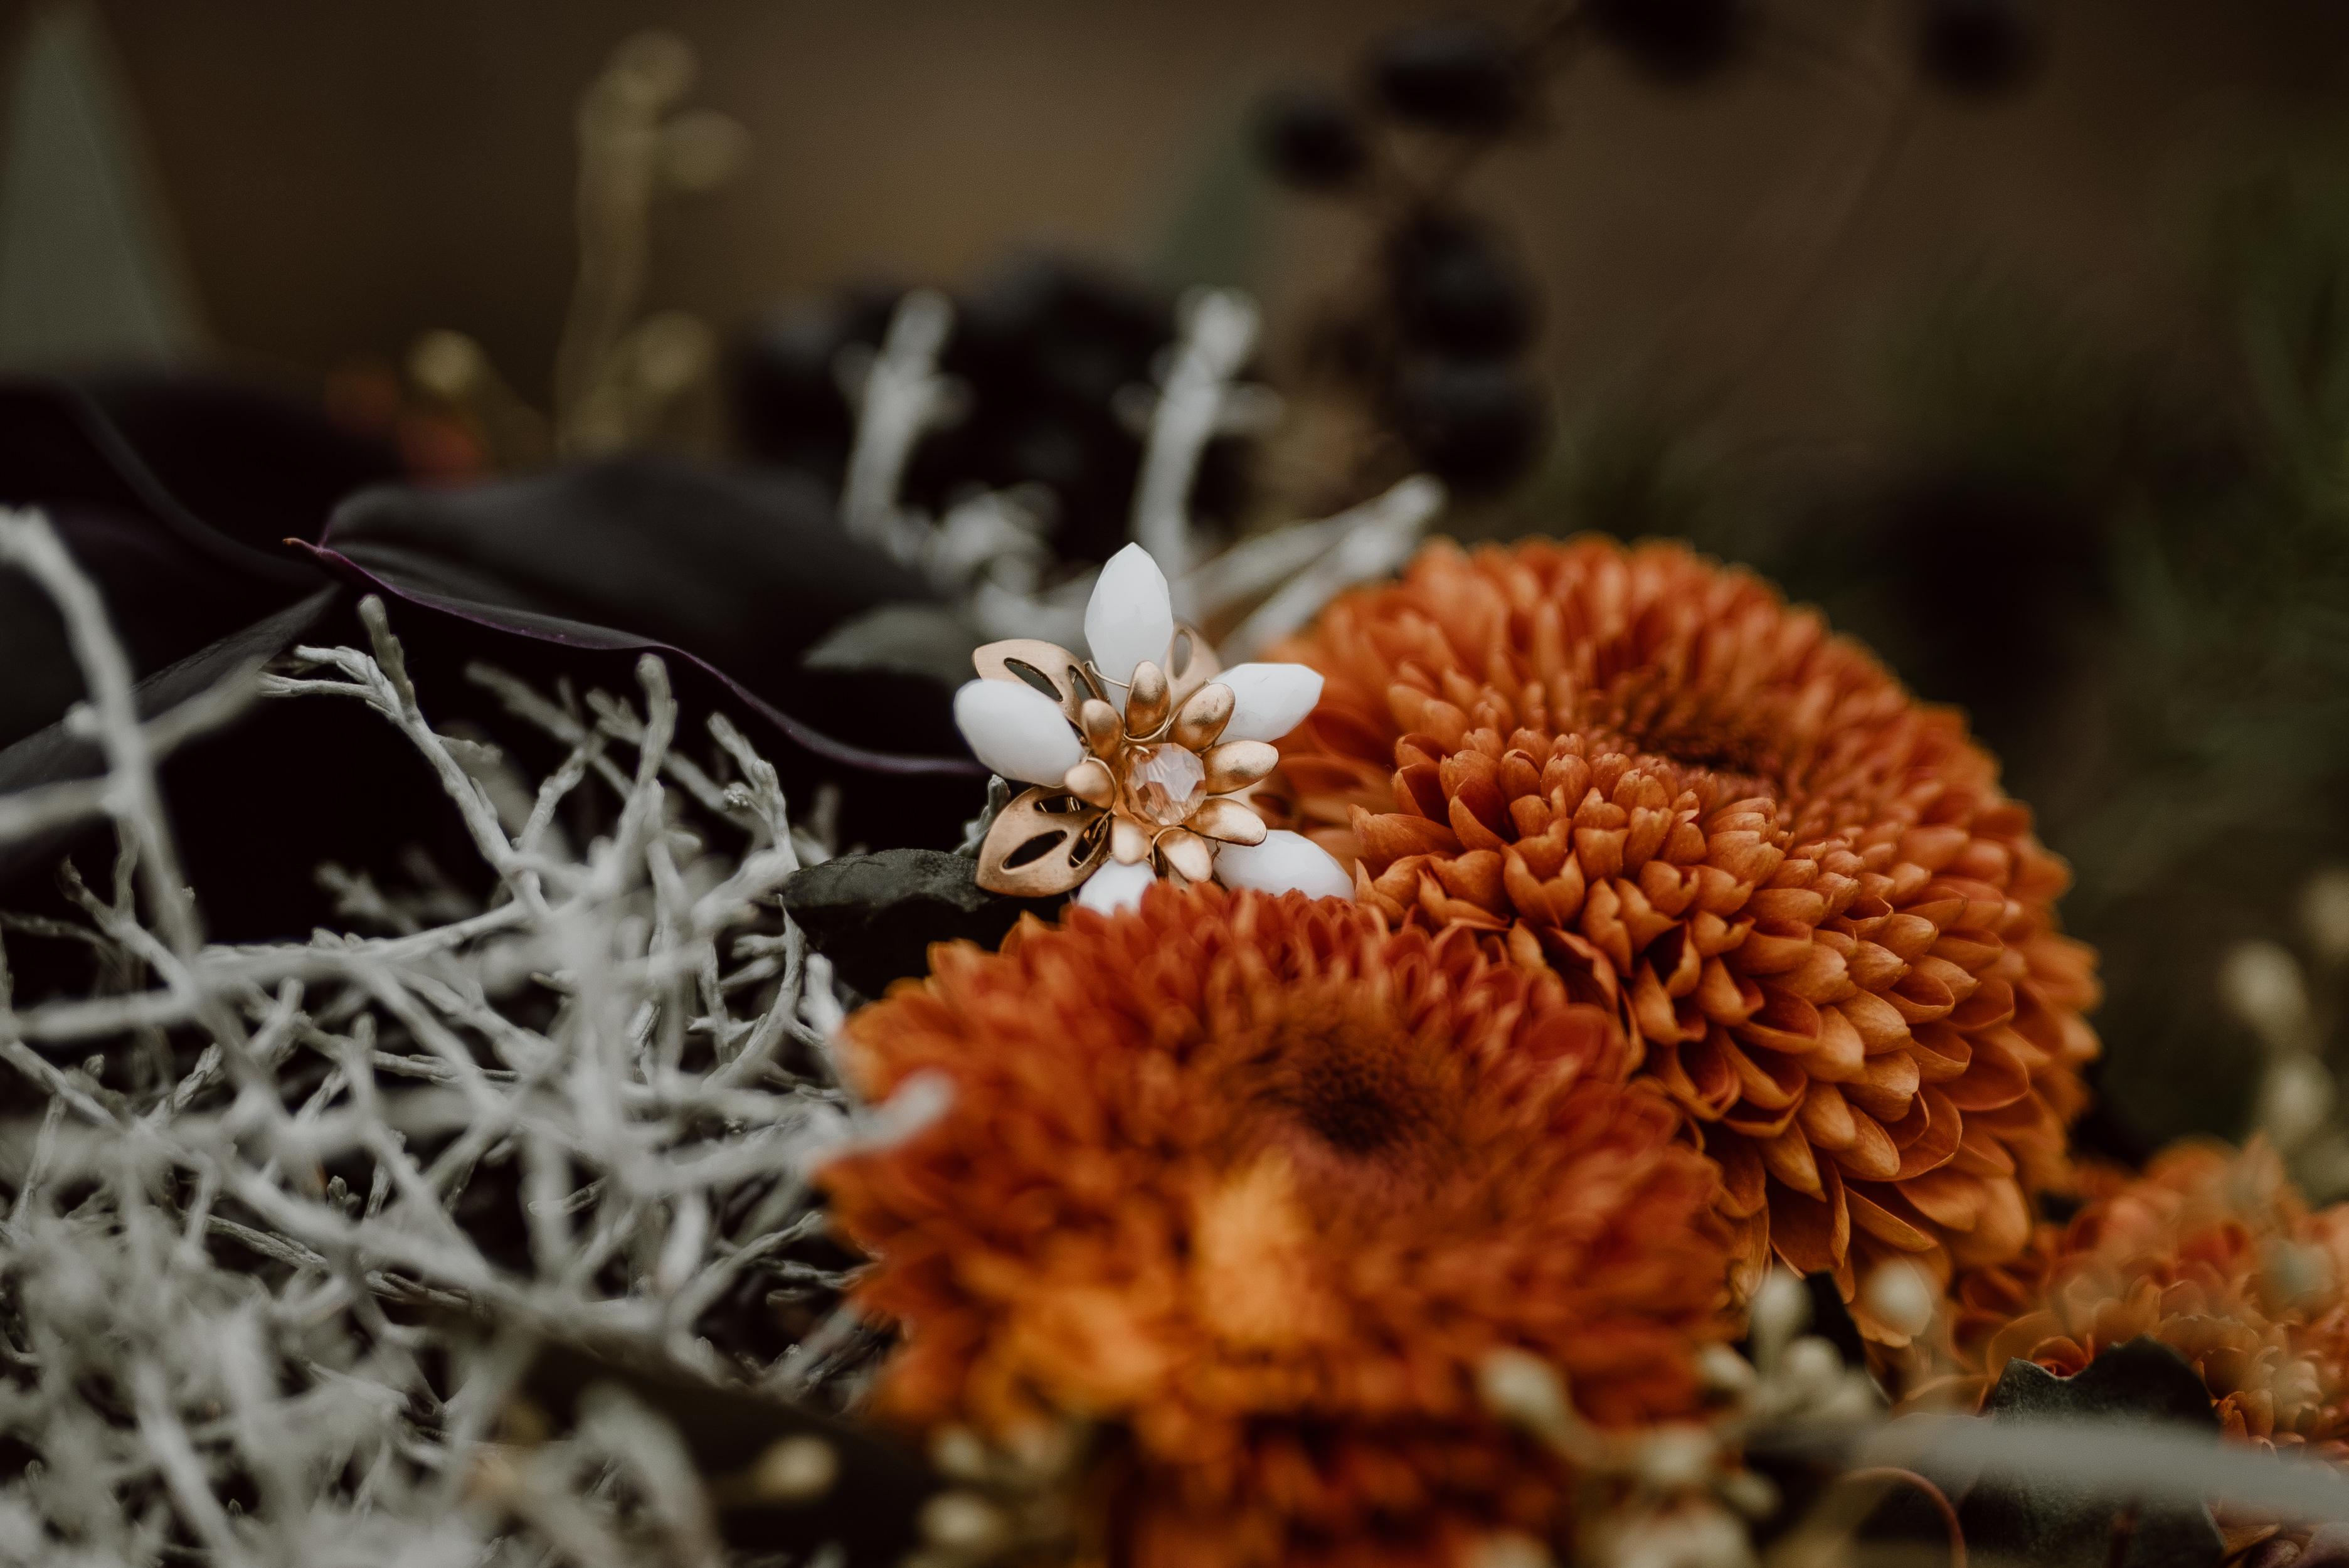 kirasteinfotografie_styled_shoot_winter-120